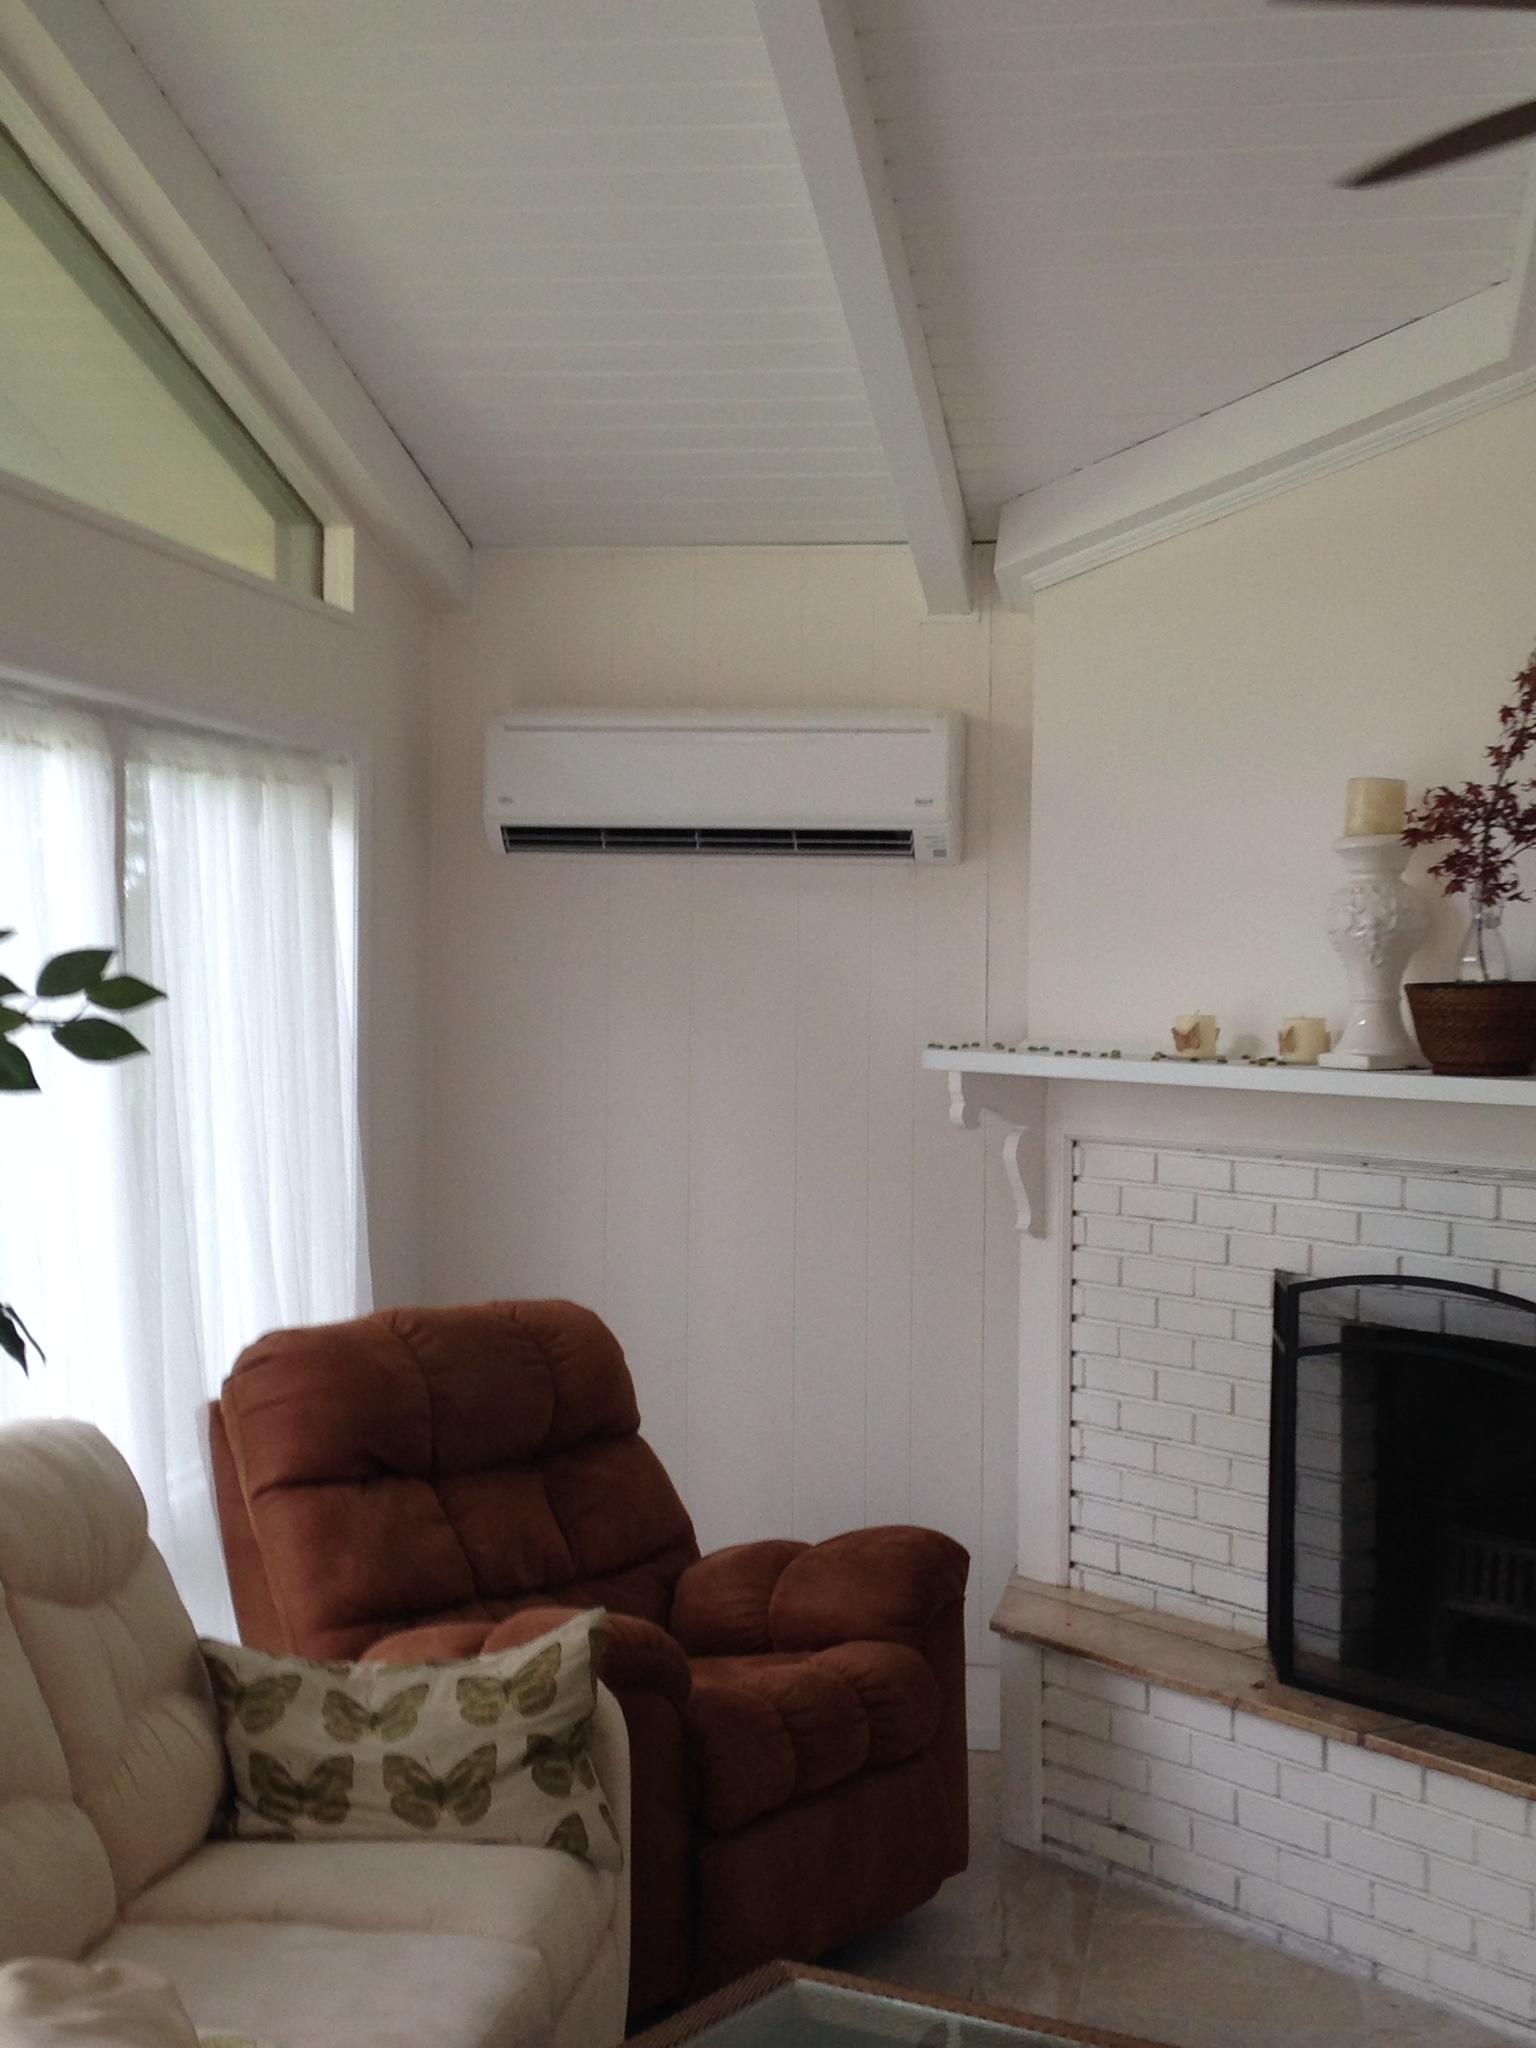 A 2 Z Plumbing Heating Air Inc image 2